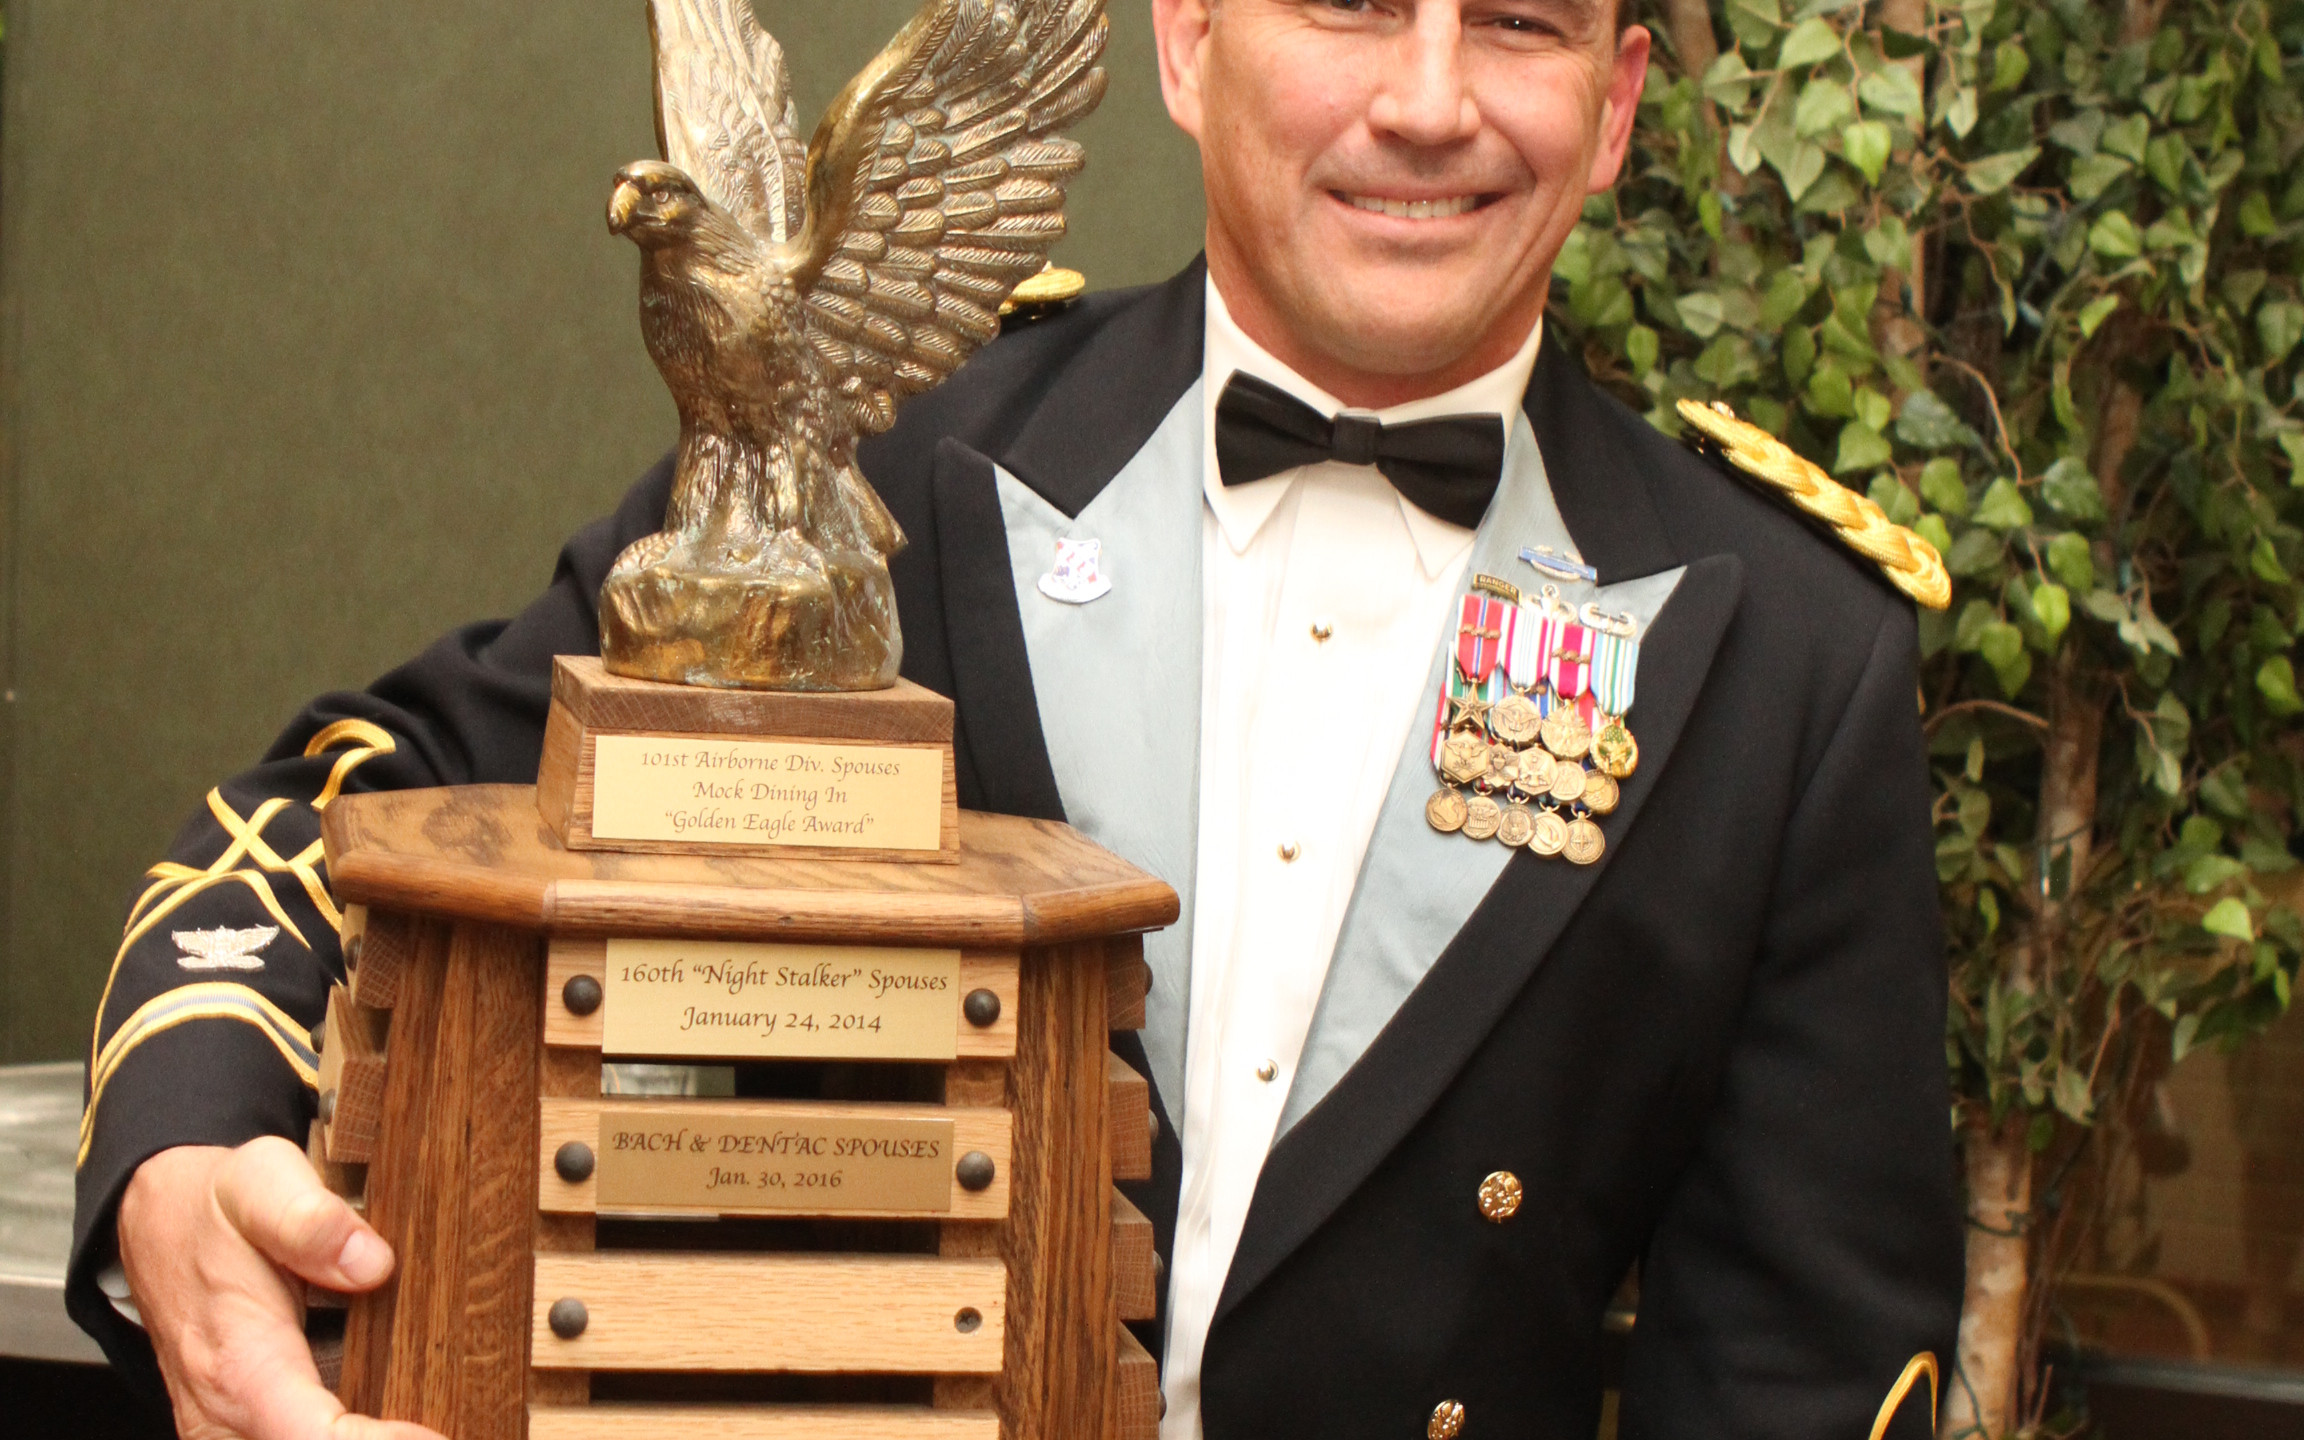 Colonel Joe Kuchan